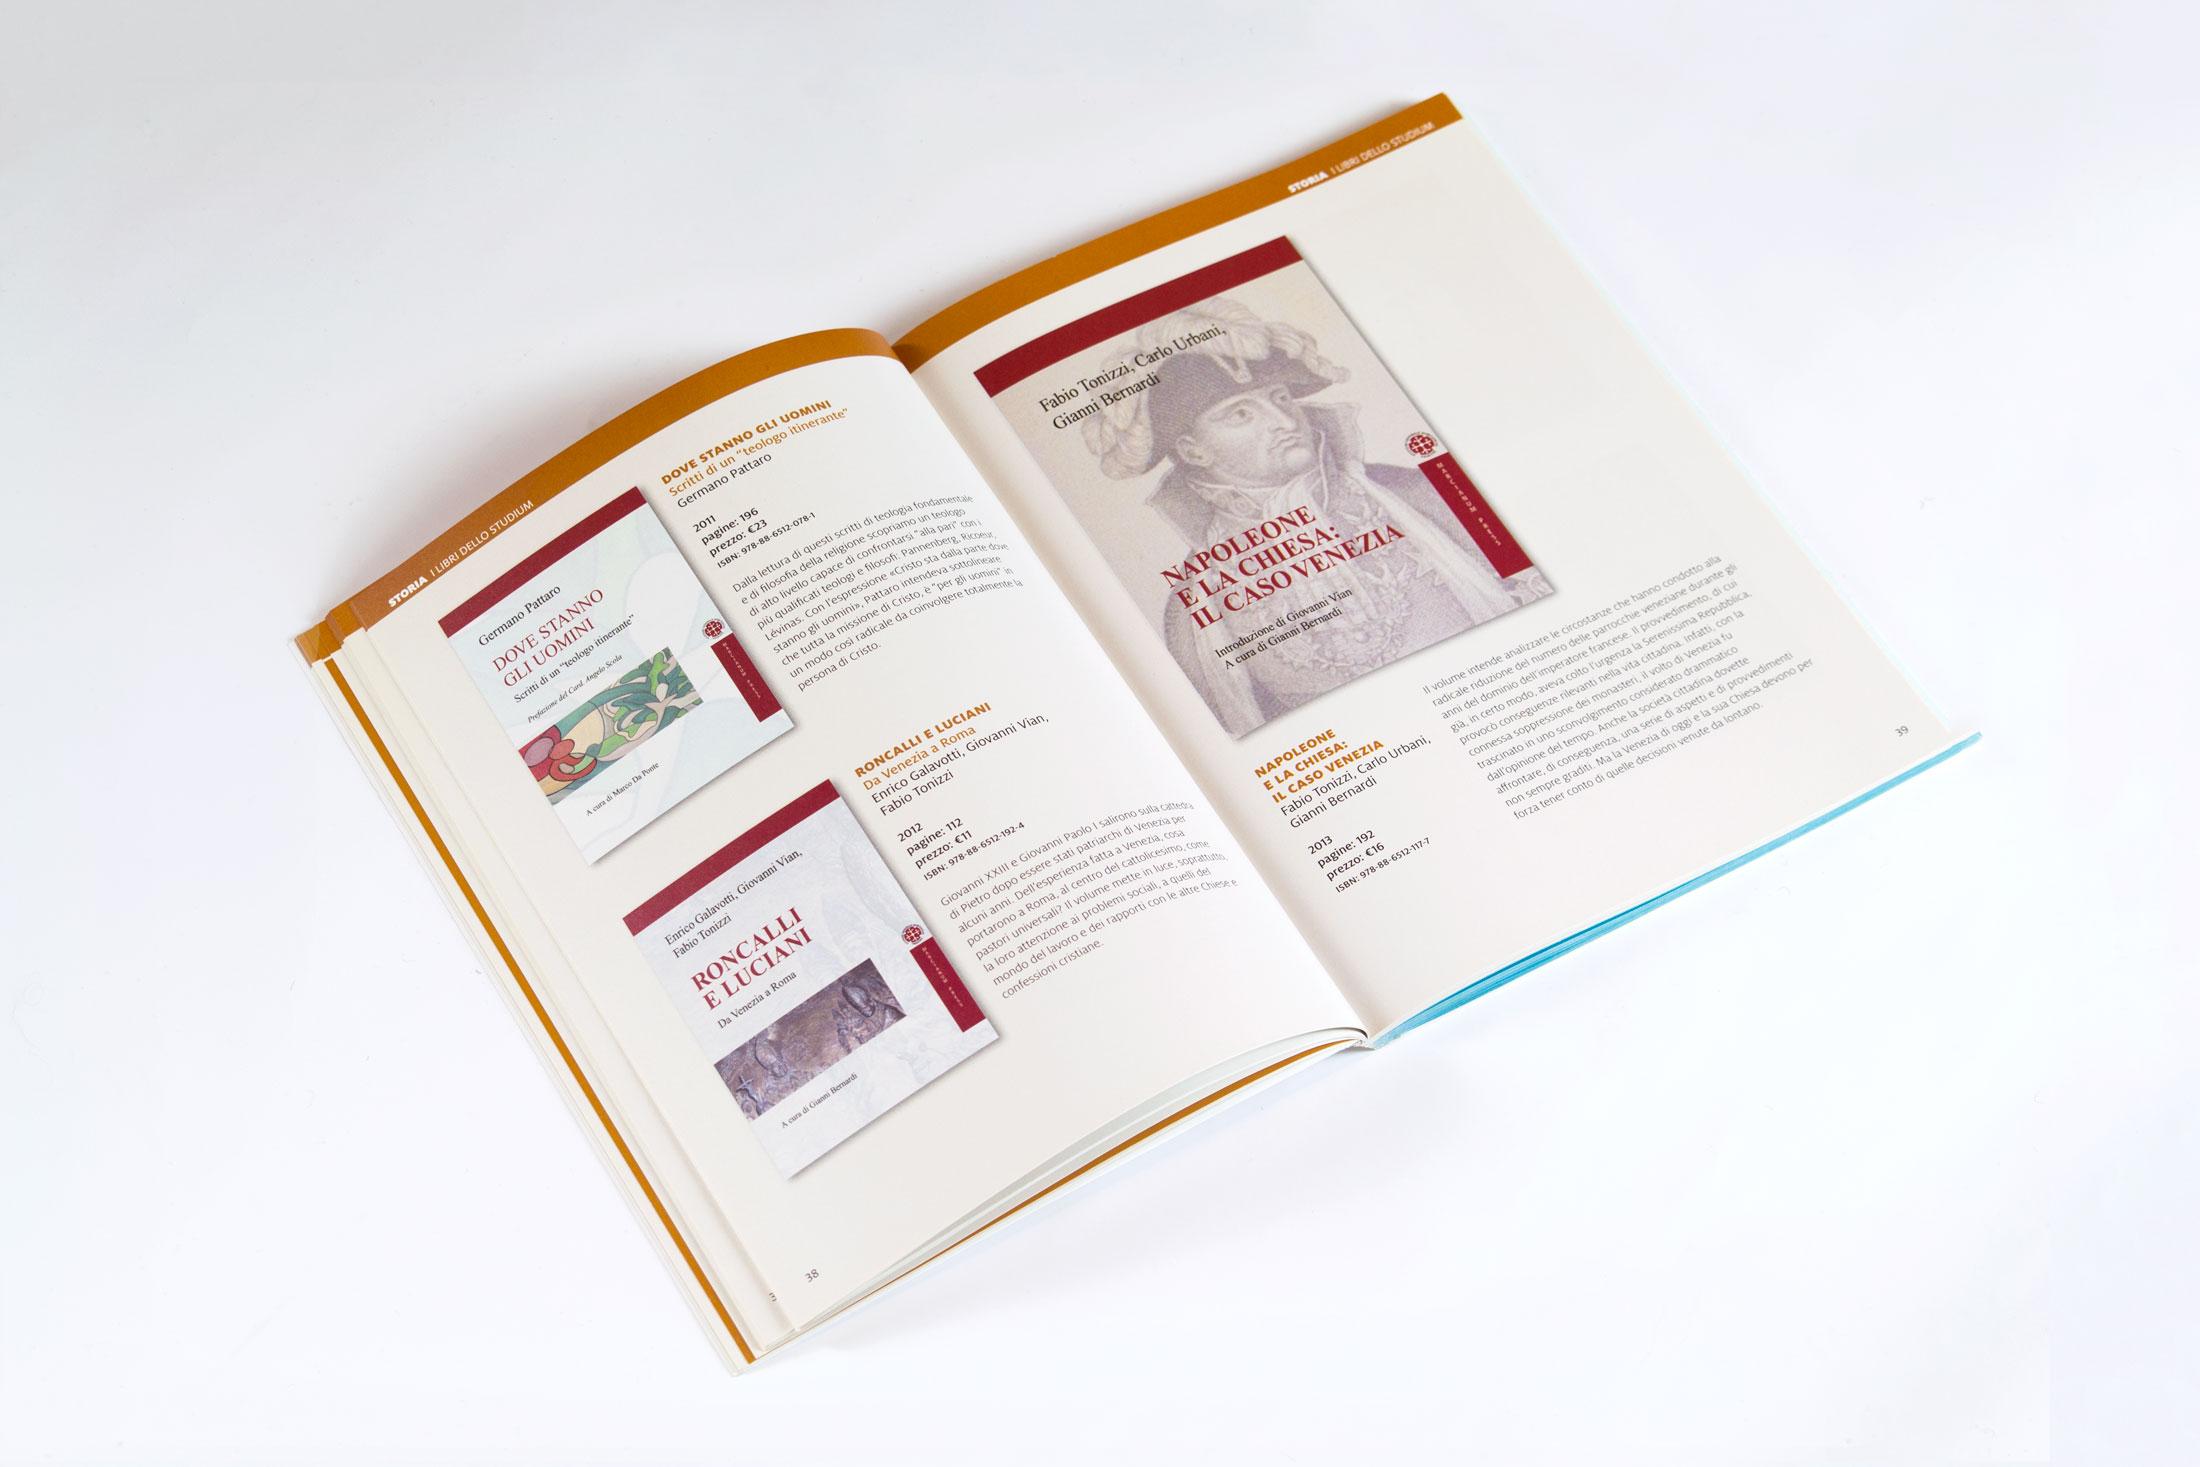 Catalogo Marcianum Press - interno 10